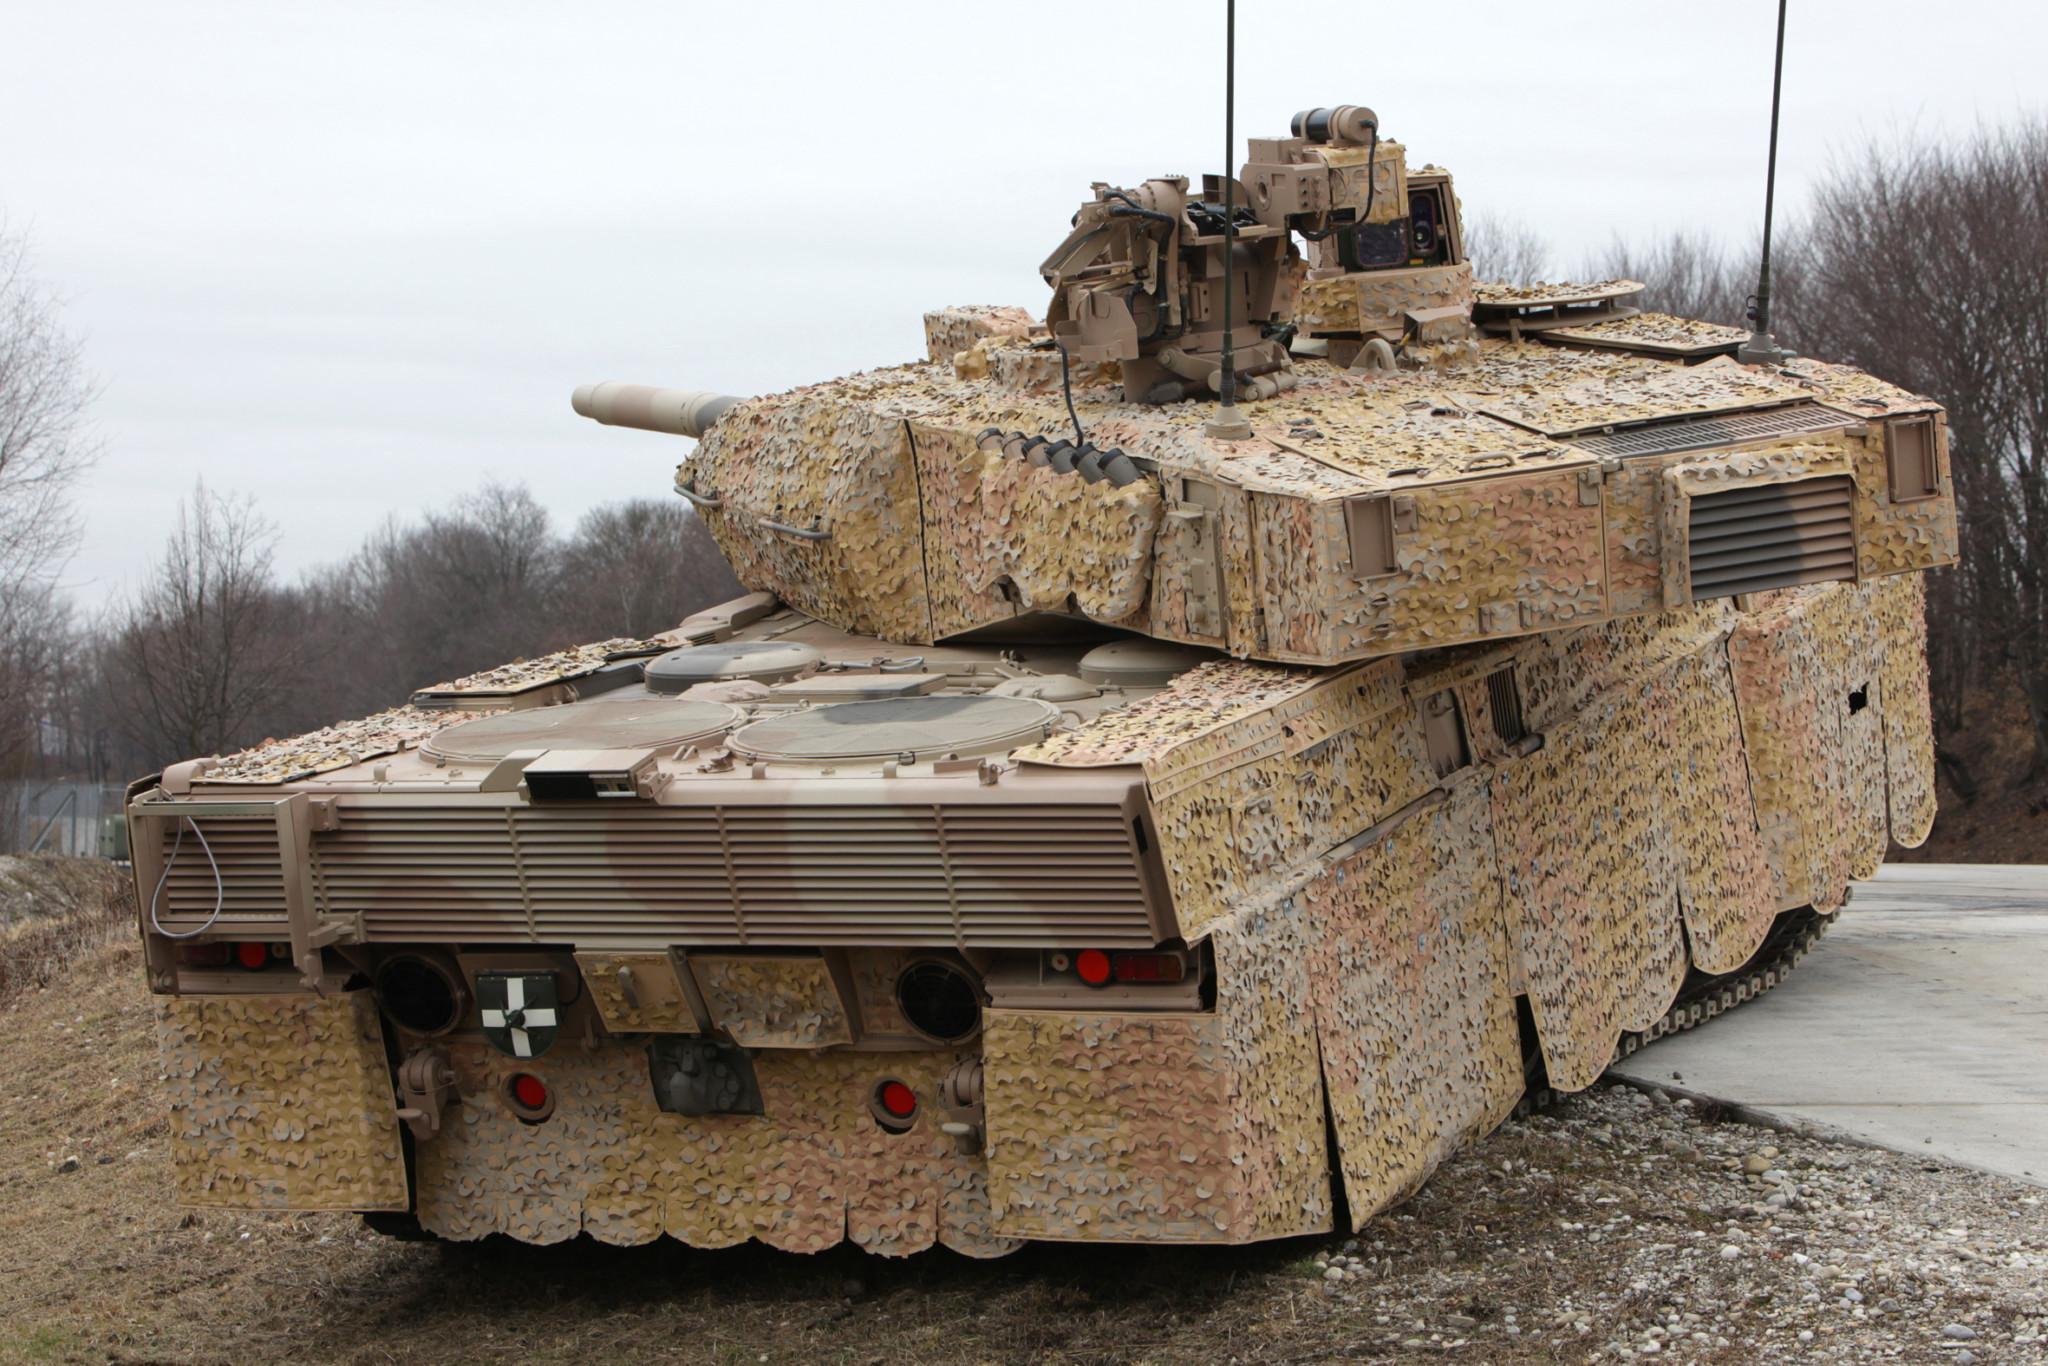 Kan levere stridsvogner på 18 måneder